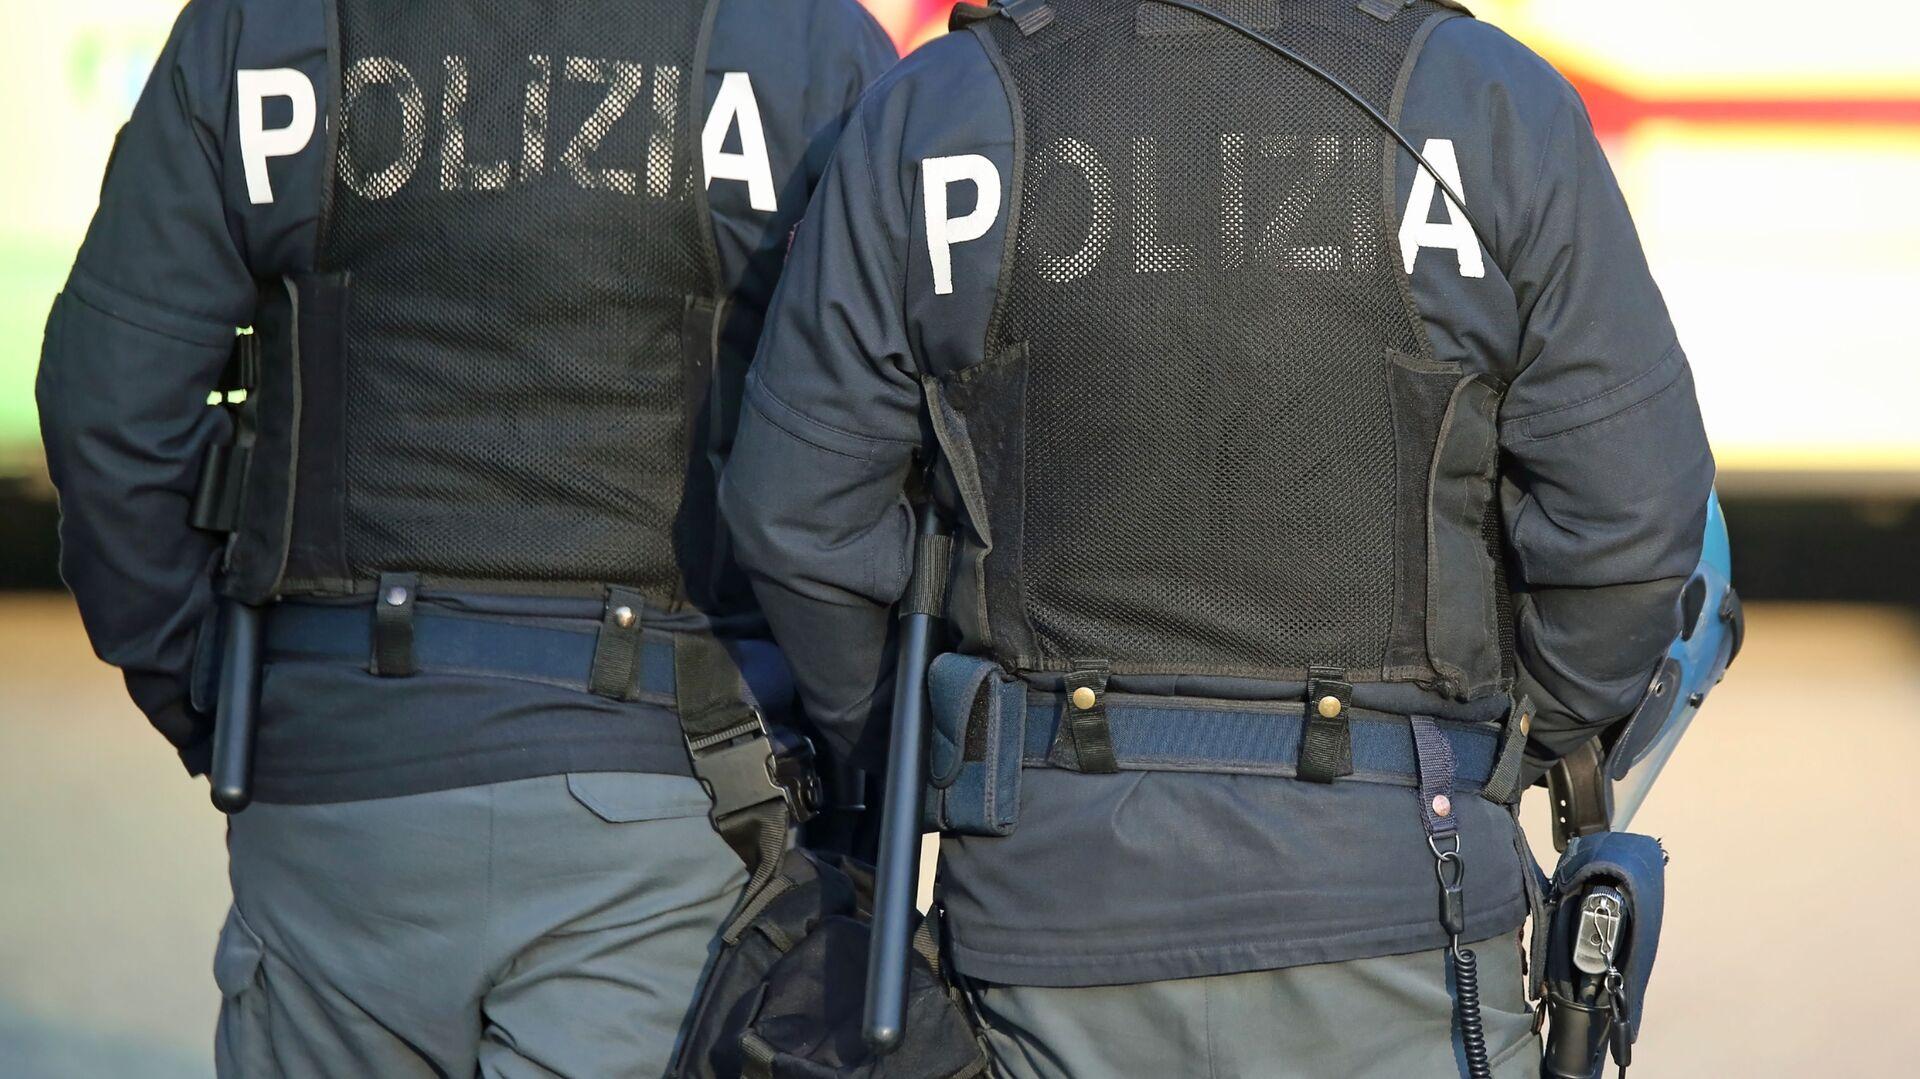 La polizia italiana - Sputnik Italia, 1920, 12.07.2021